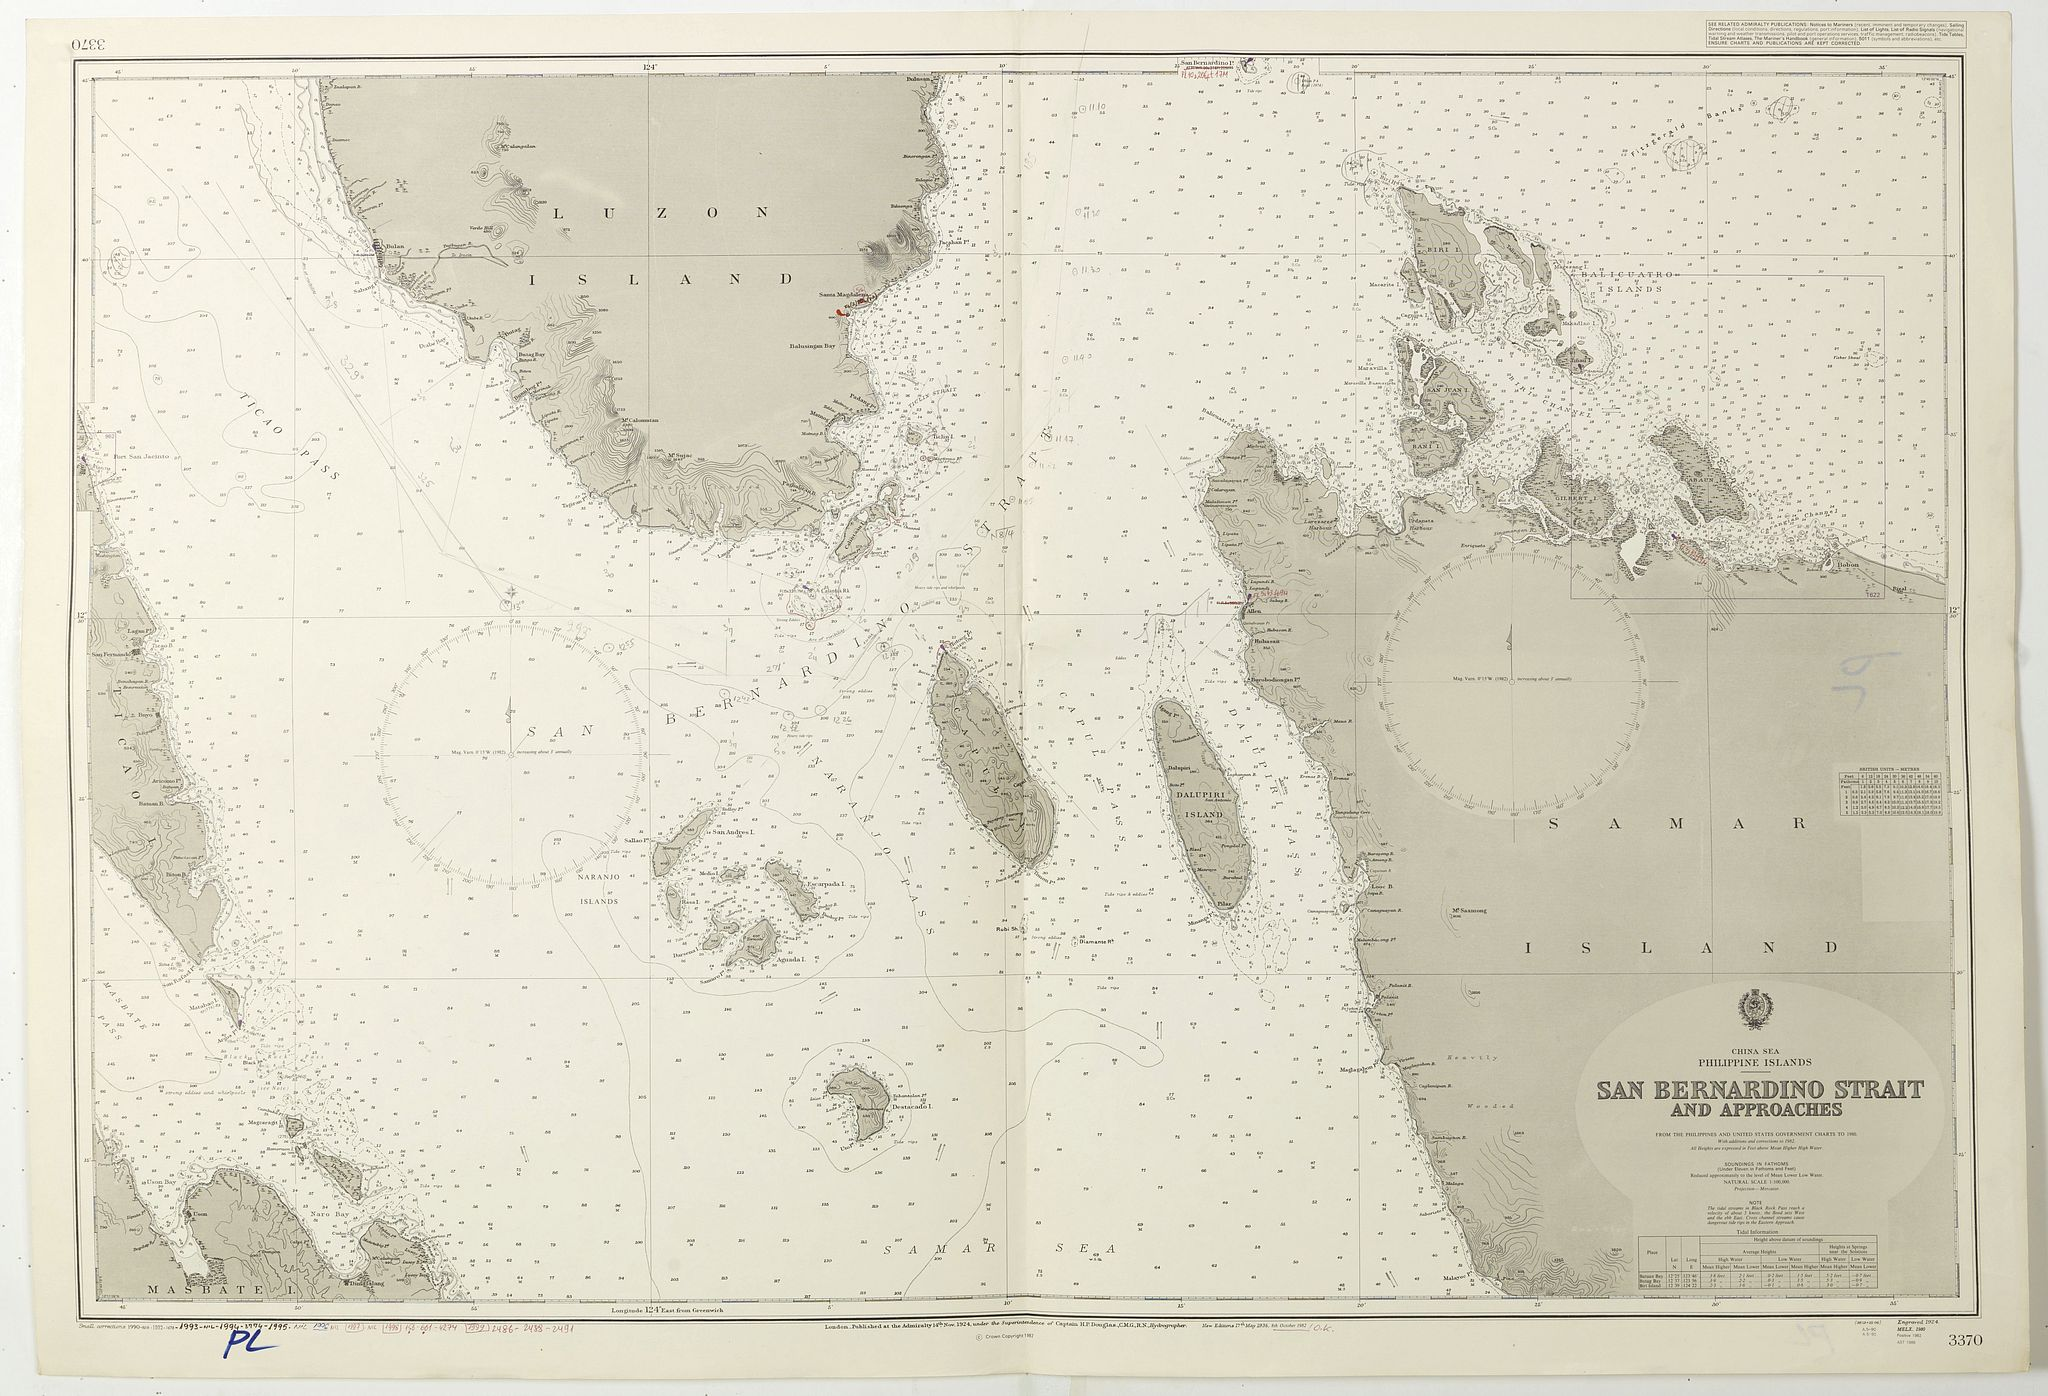 LONDON ADMIRALTY. -  China Sea Philippine Islands - San Bernandino Strait and approaches. (3370)